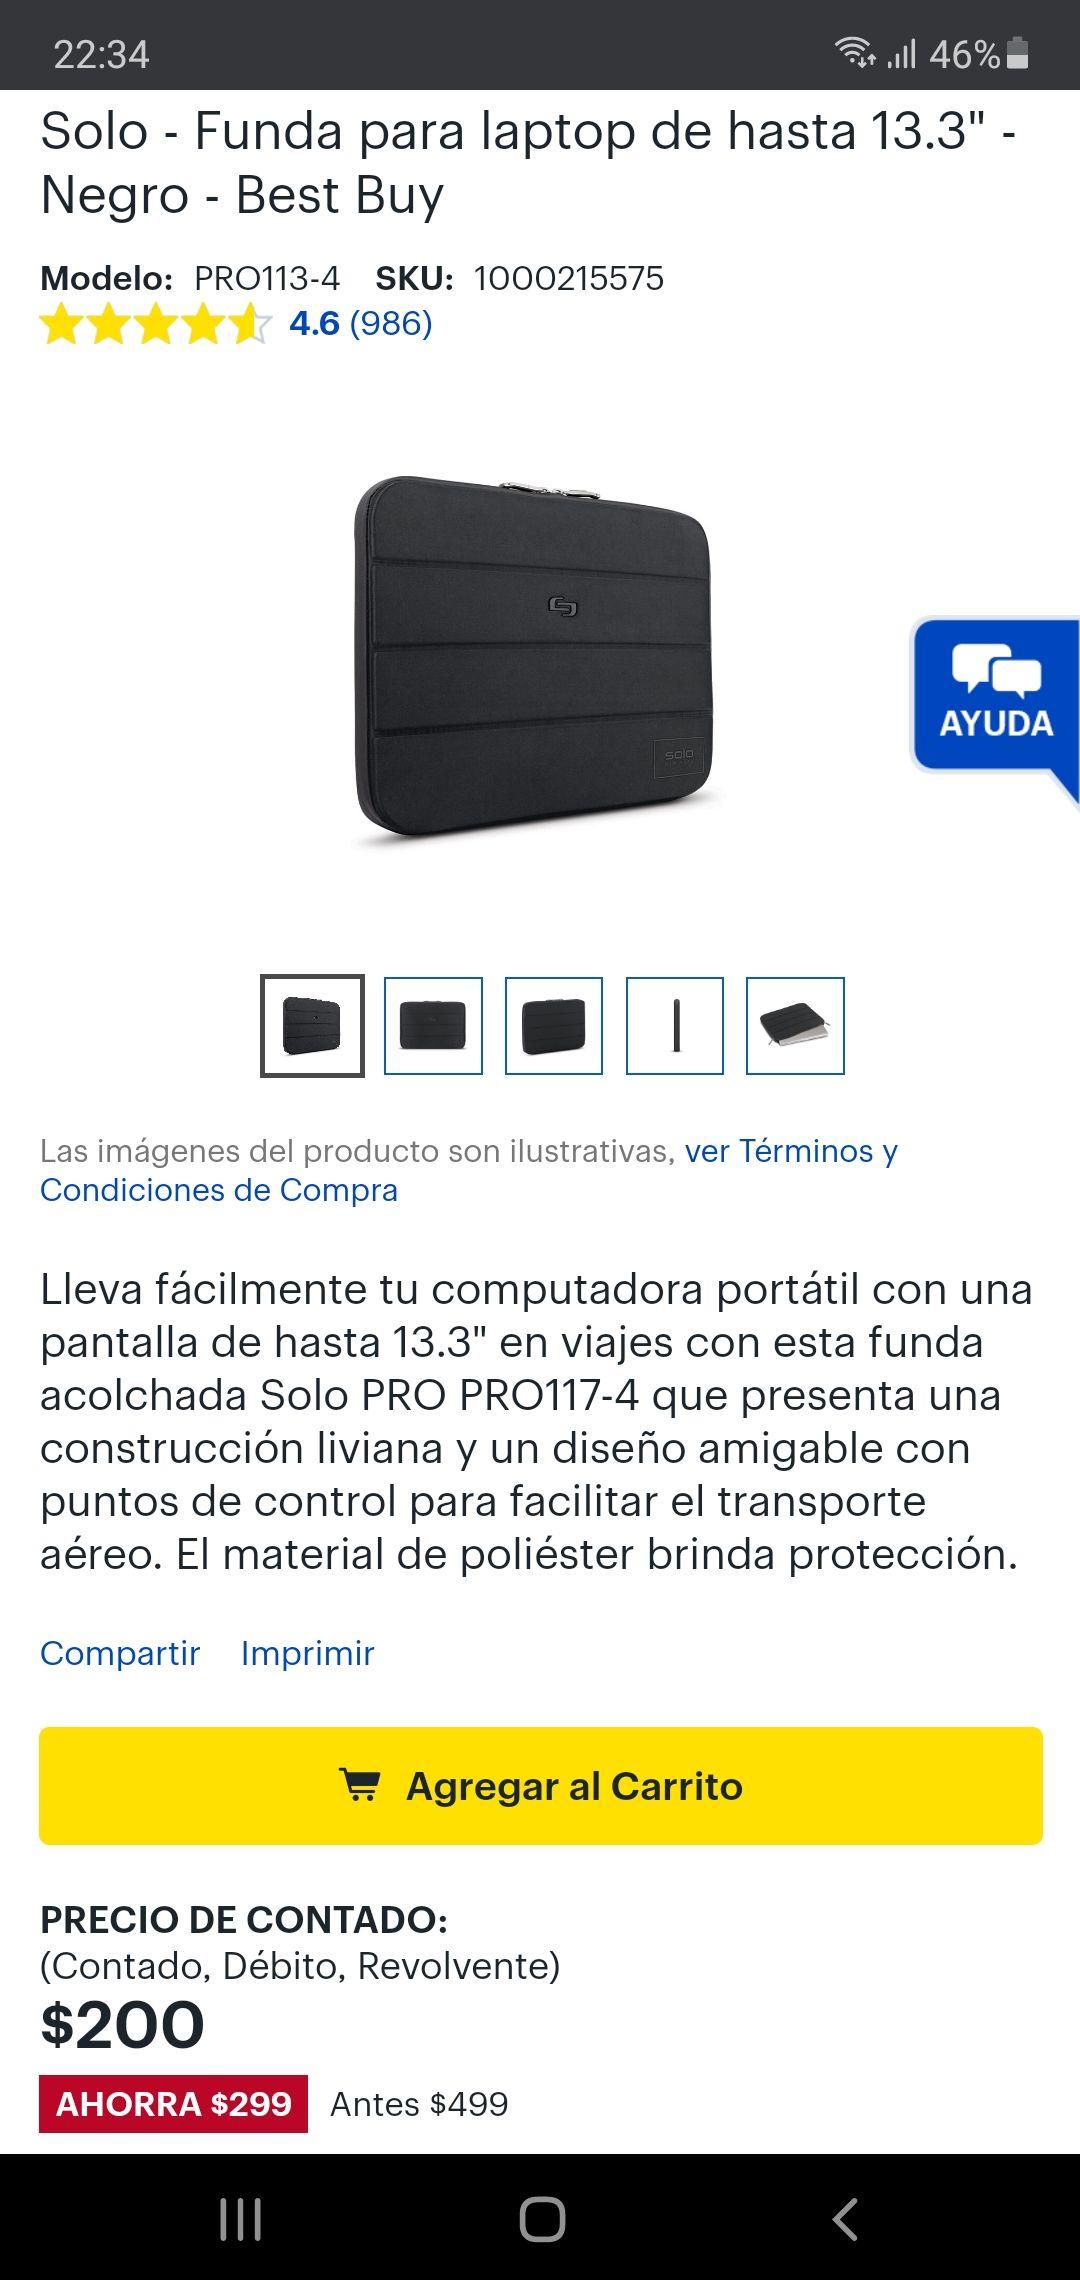 "Best Buy: Solo - Funda para laptop de hasta 13.3"" - Negro"